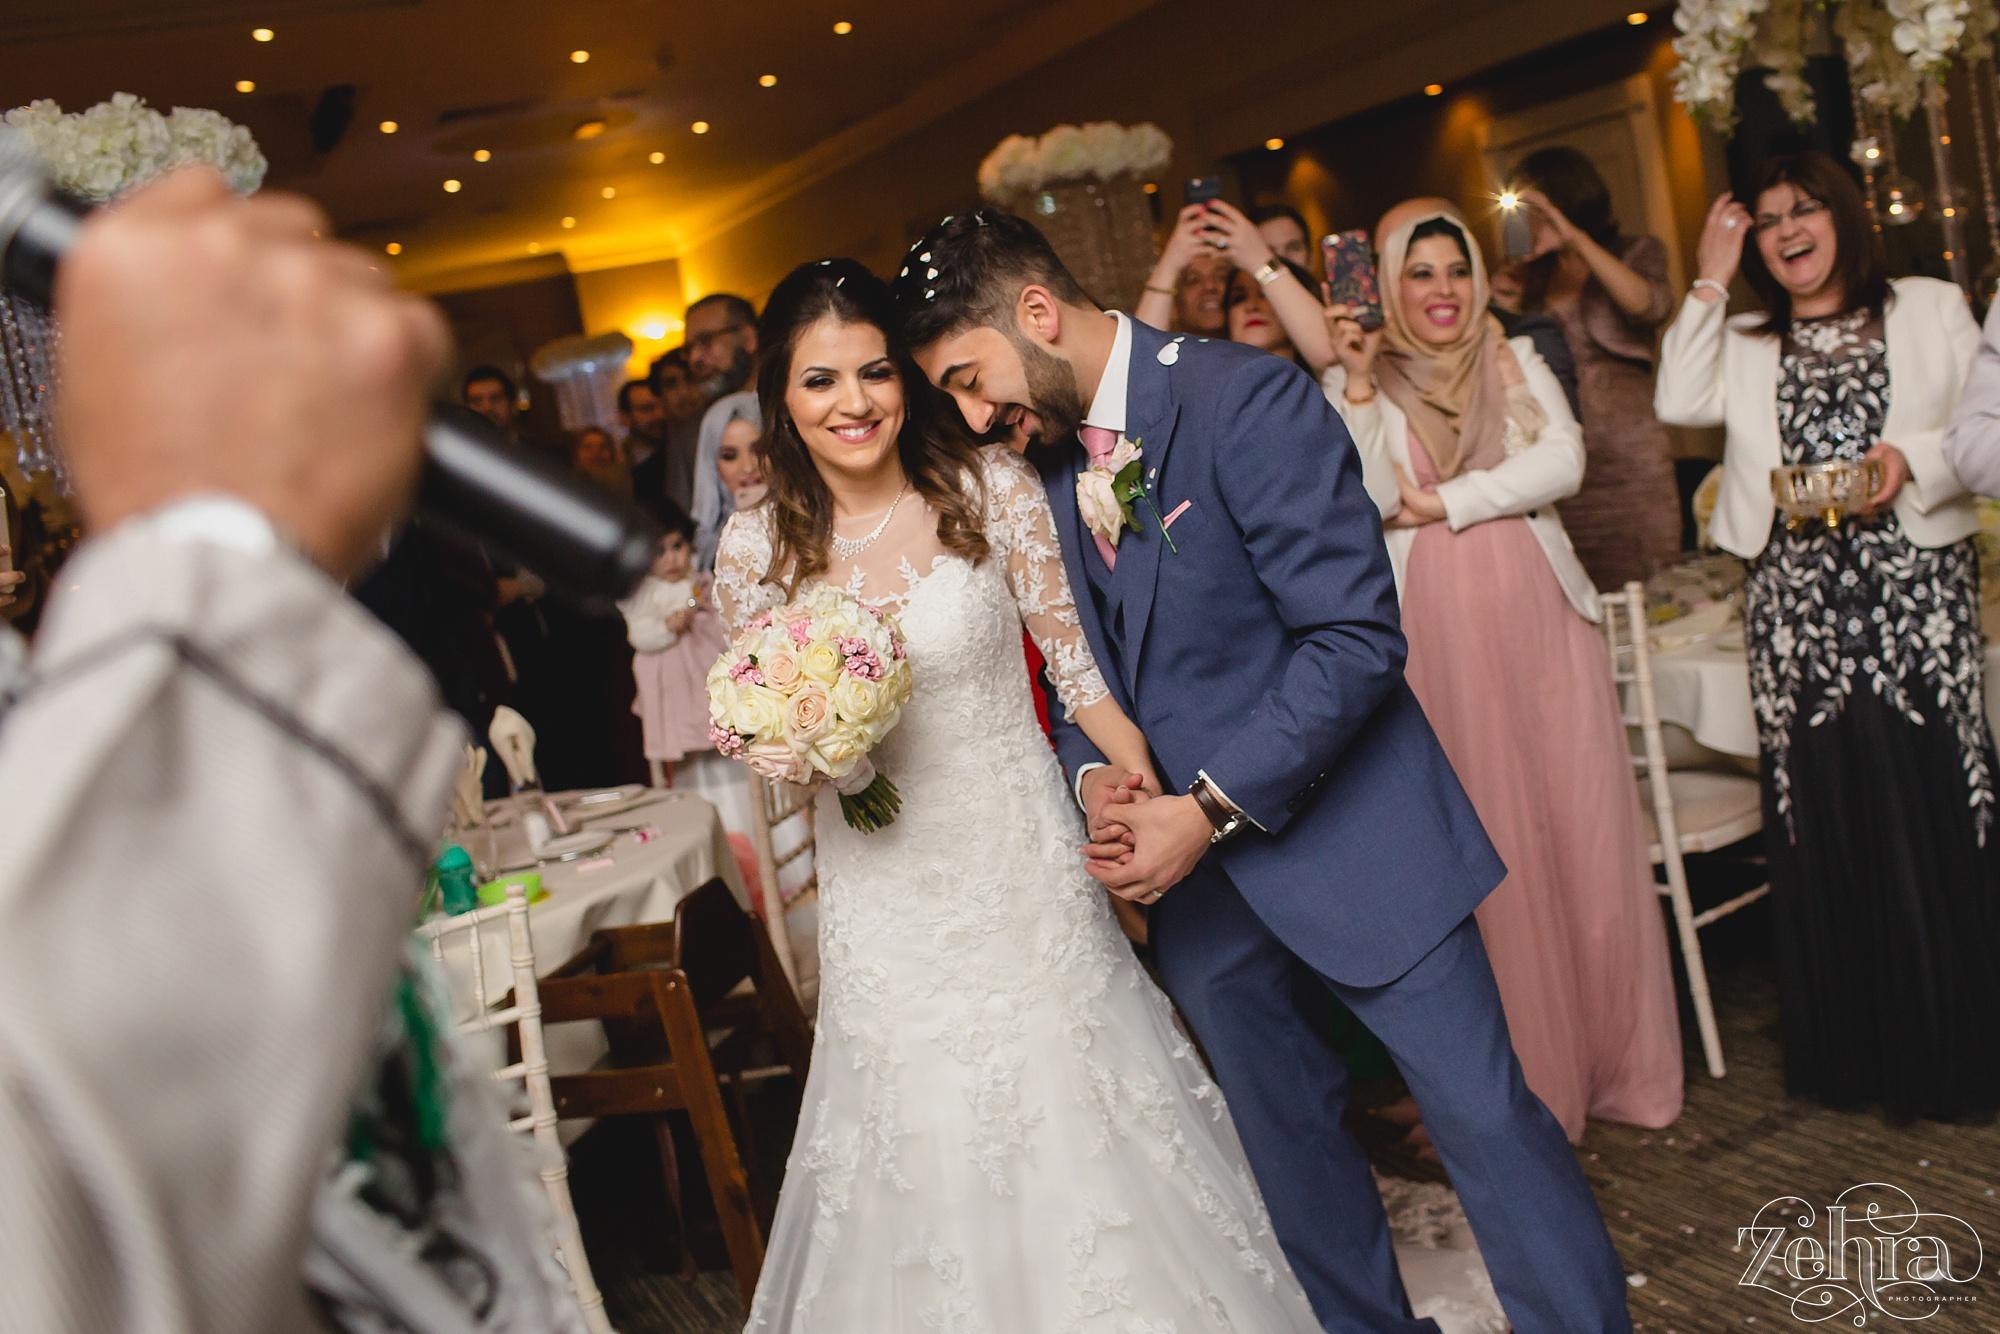 zehra photographer mere cheshire wedding_0031.jpg